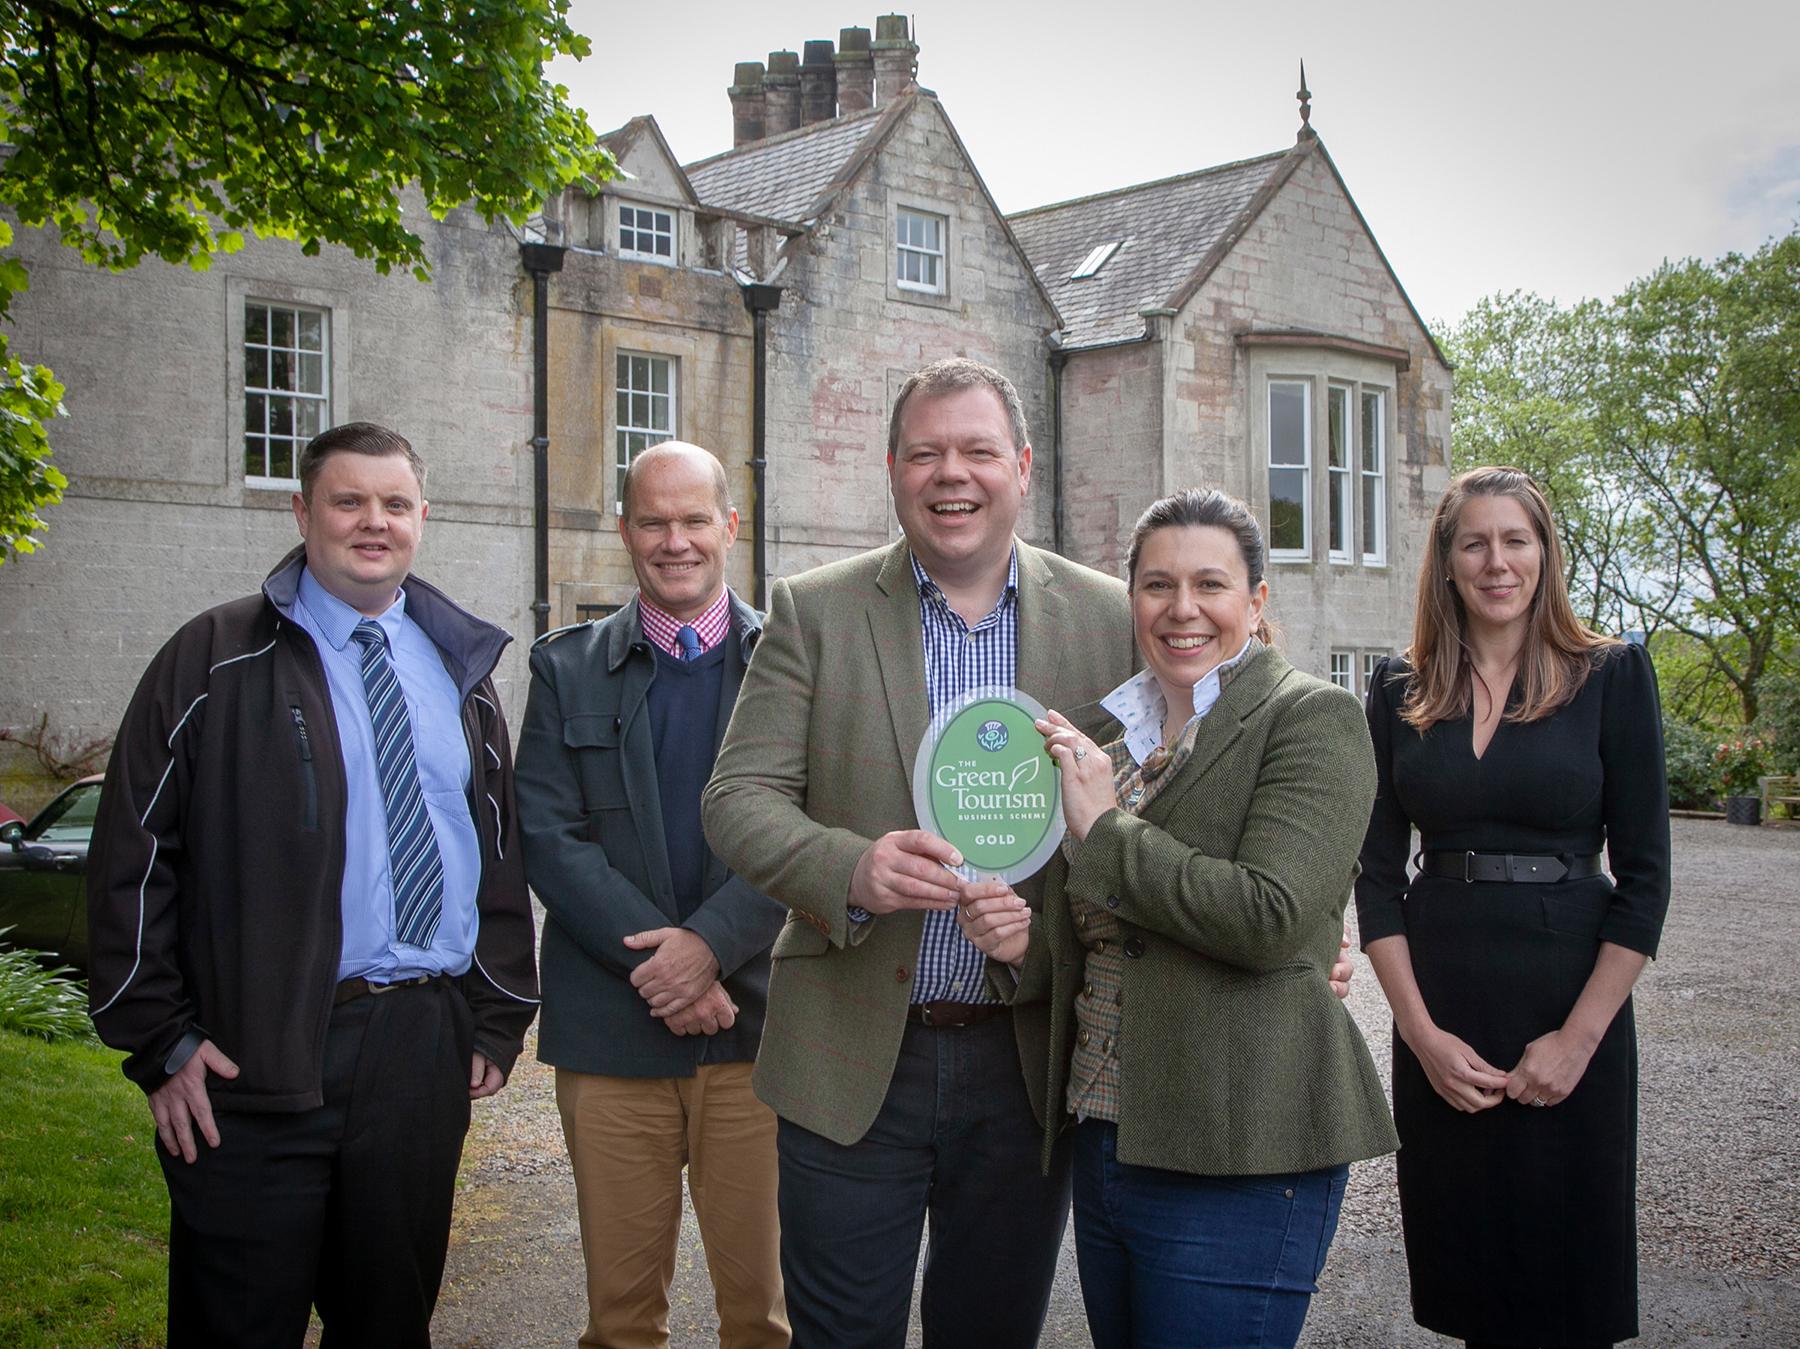 Green Tourism Gold Award Nithbank Country Estate